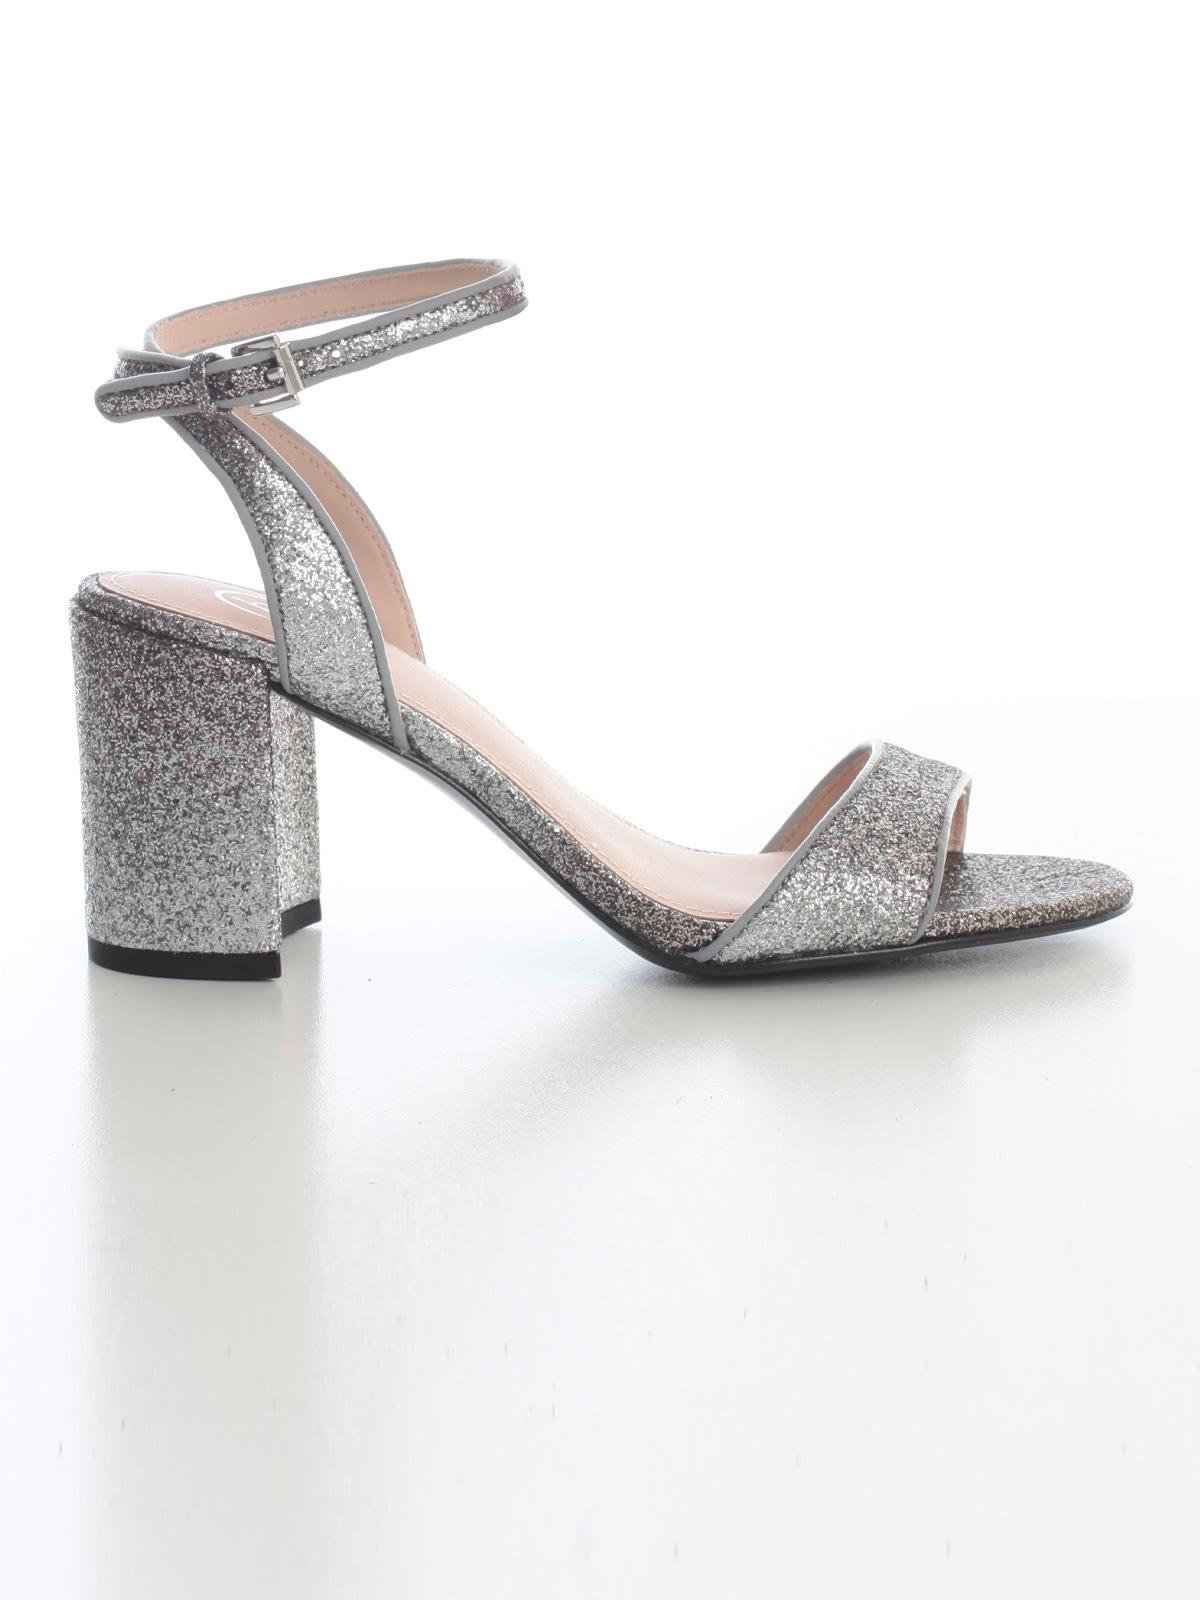 Ash Sandals 70 Heel W/glitter